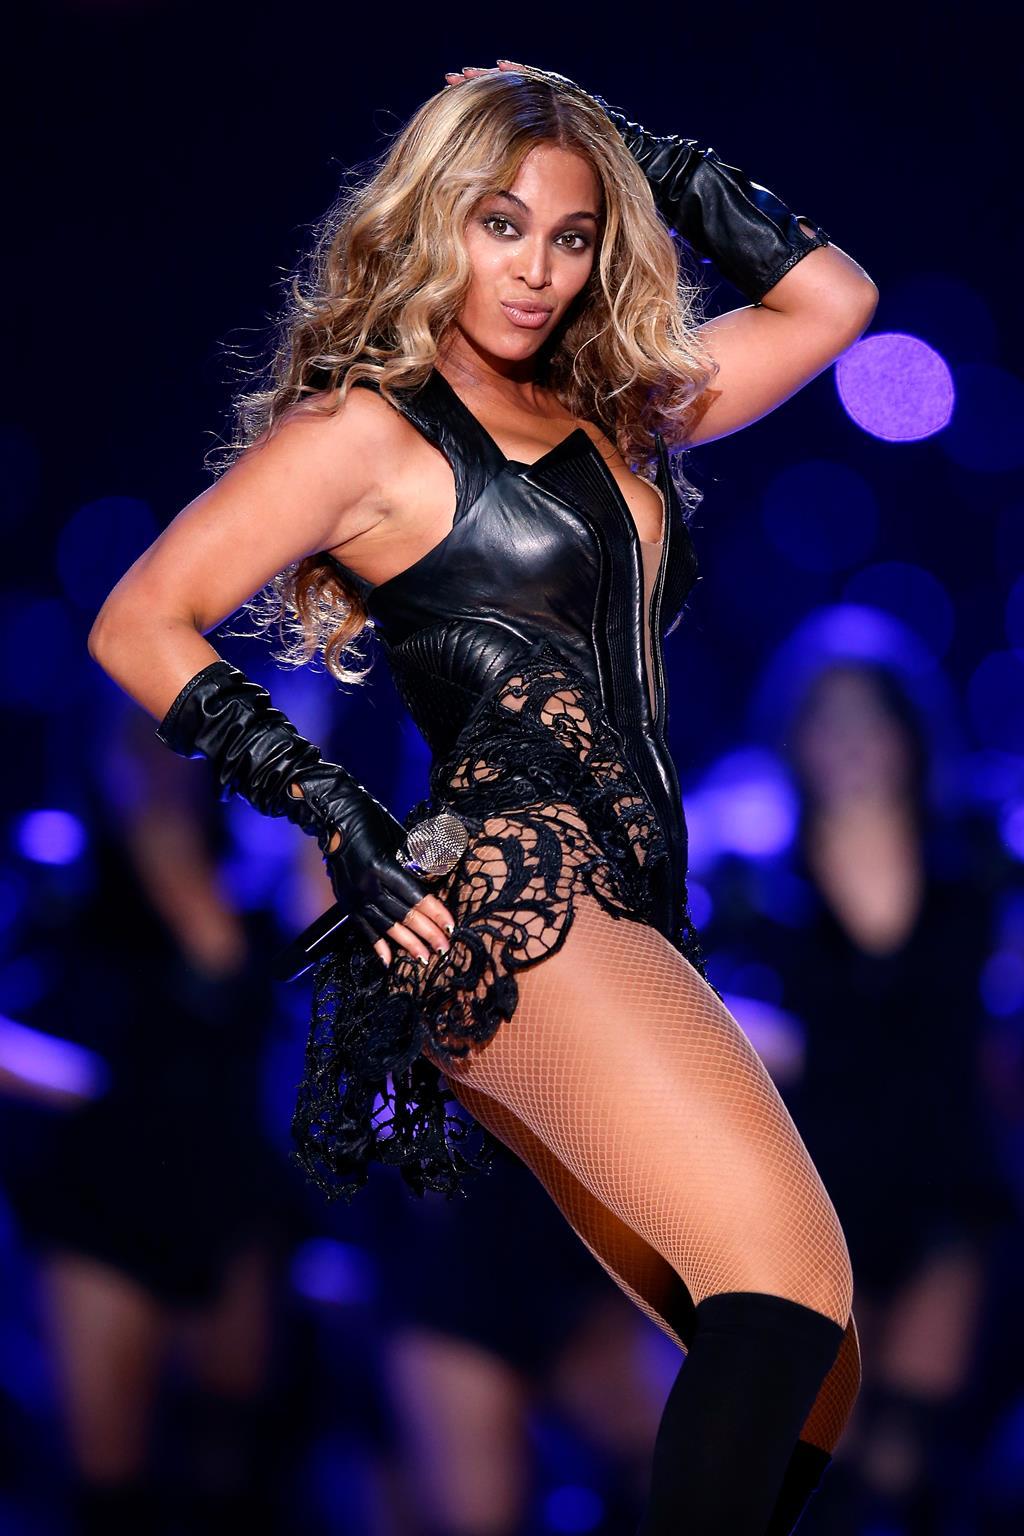 AN23072439Singer Beyonce Kn